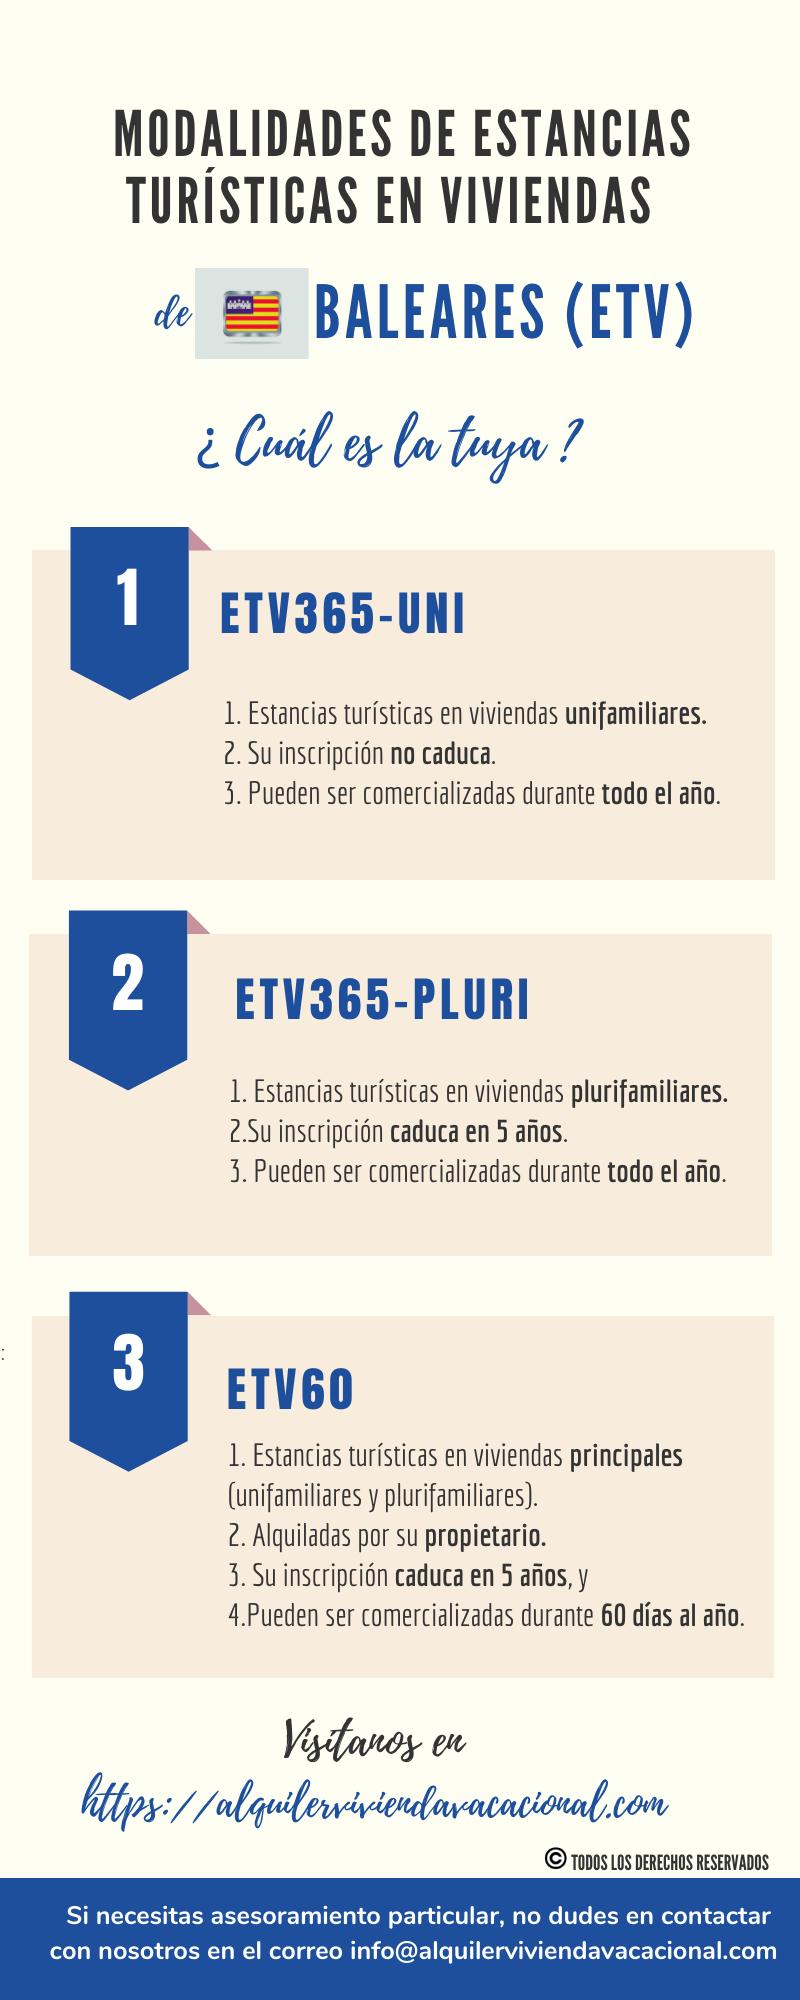 ETV365-UNI, ETV365-PLURI, ETV60